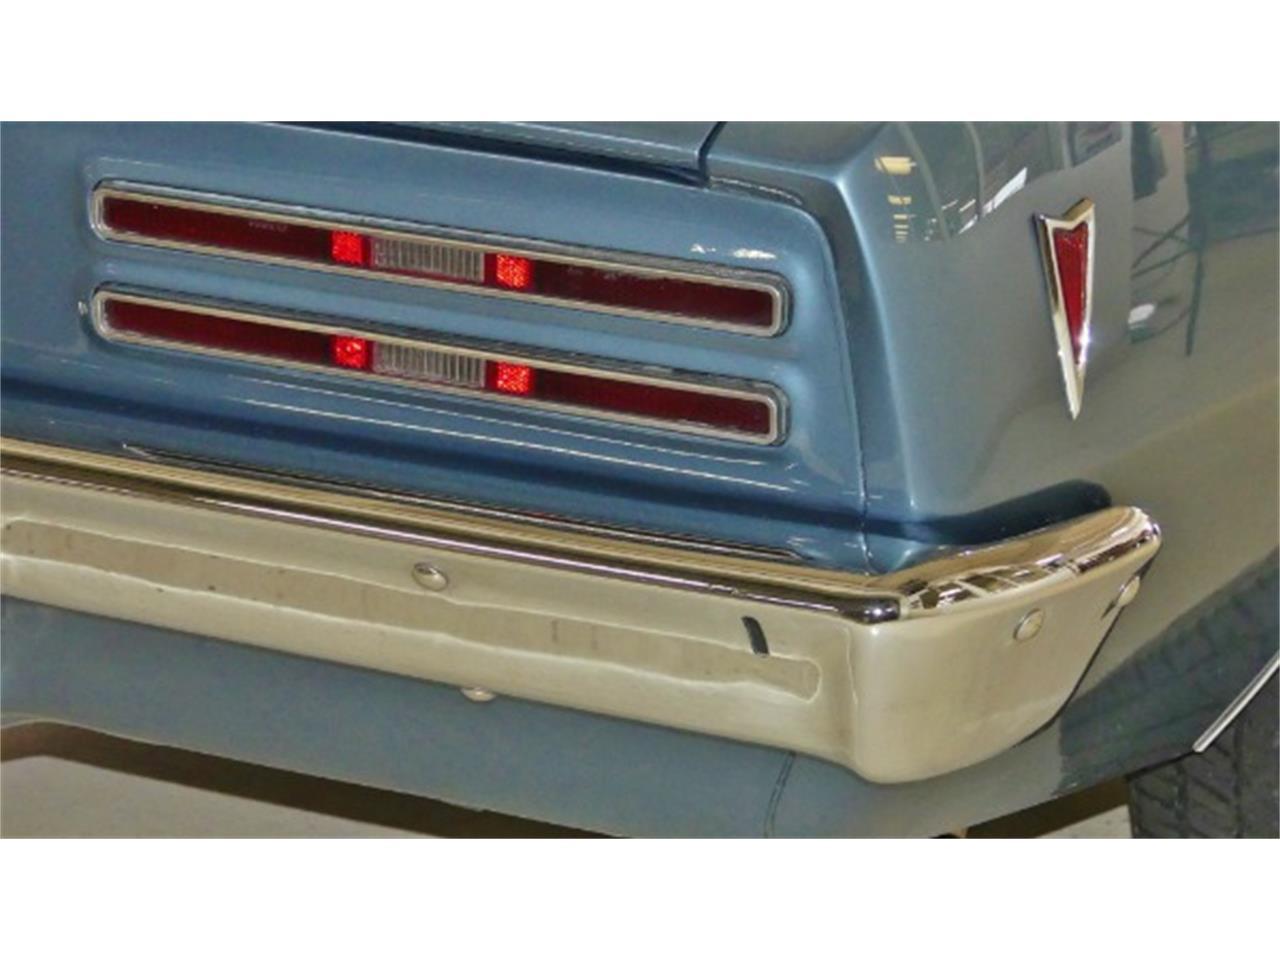 Large Picture of '68 Firebird located in Columbus Ohio - $31,995.00 - Q2MS